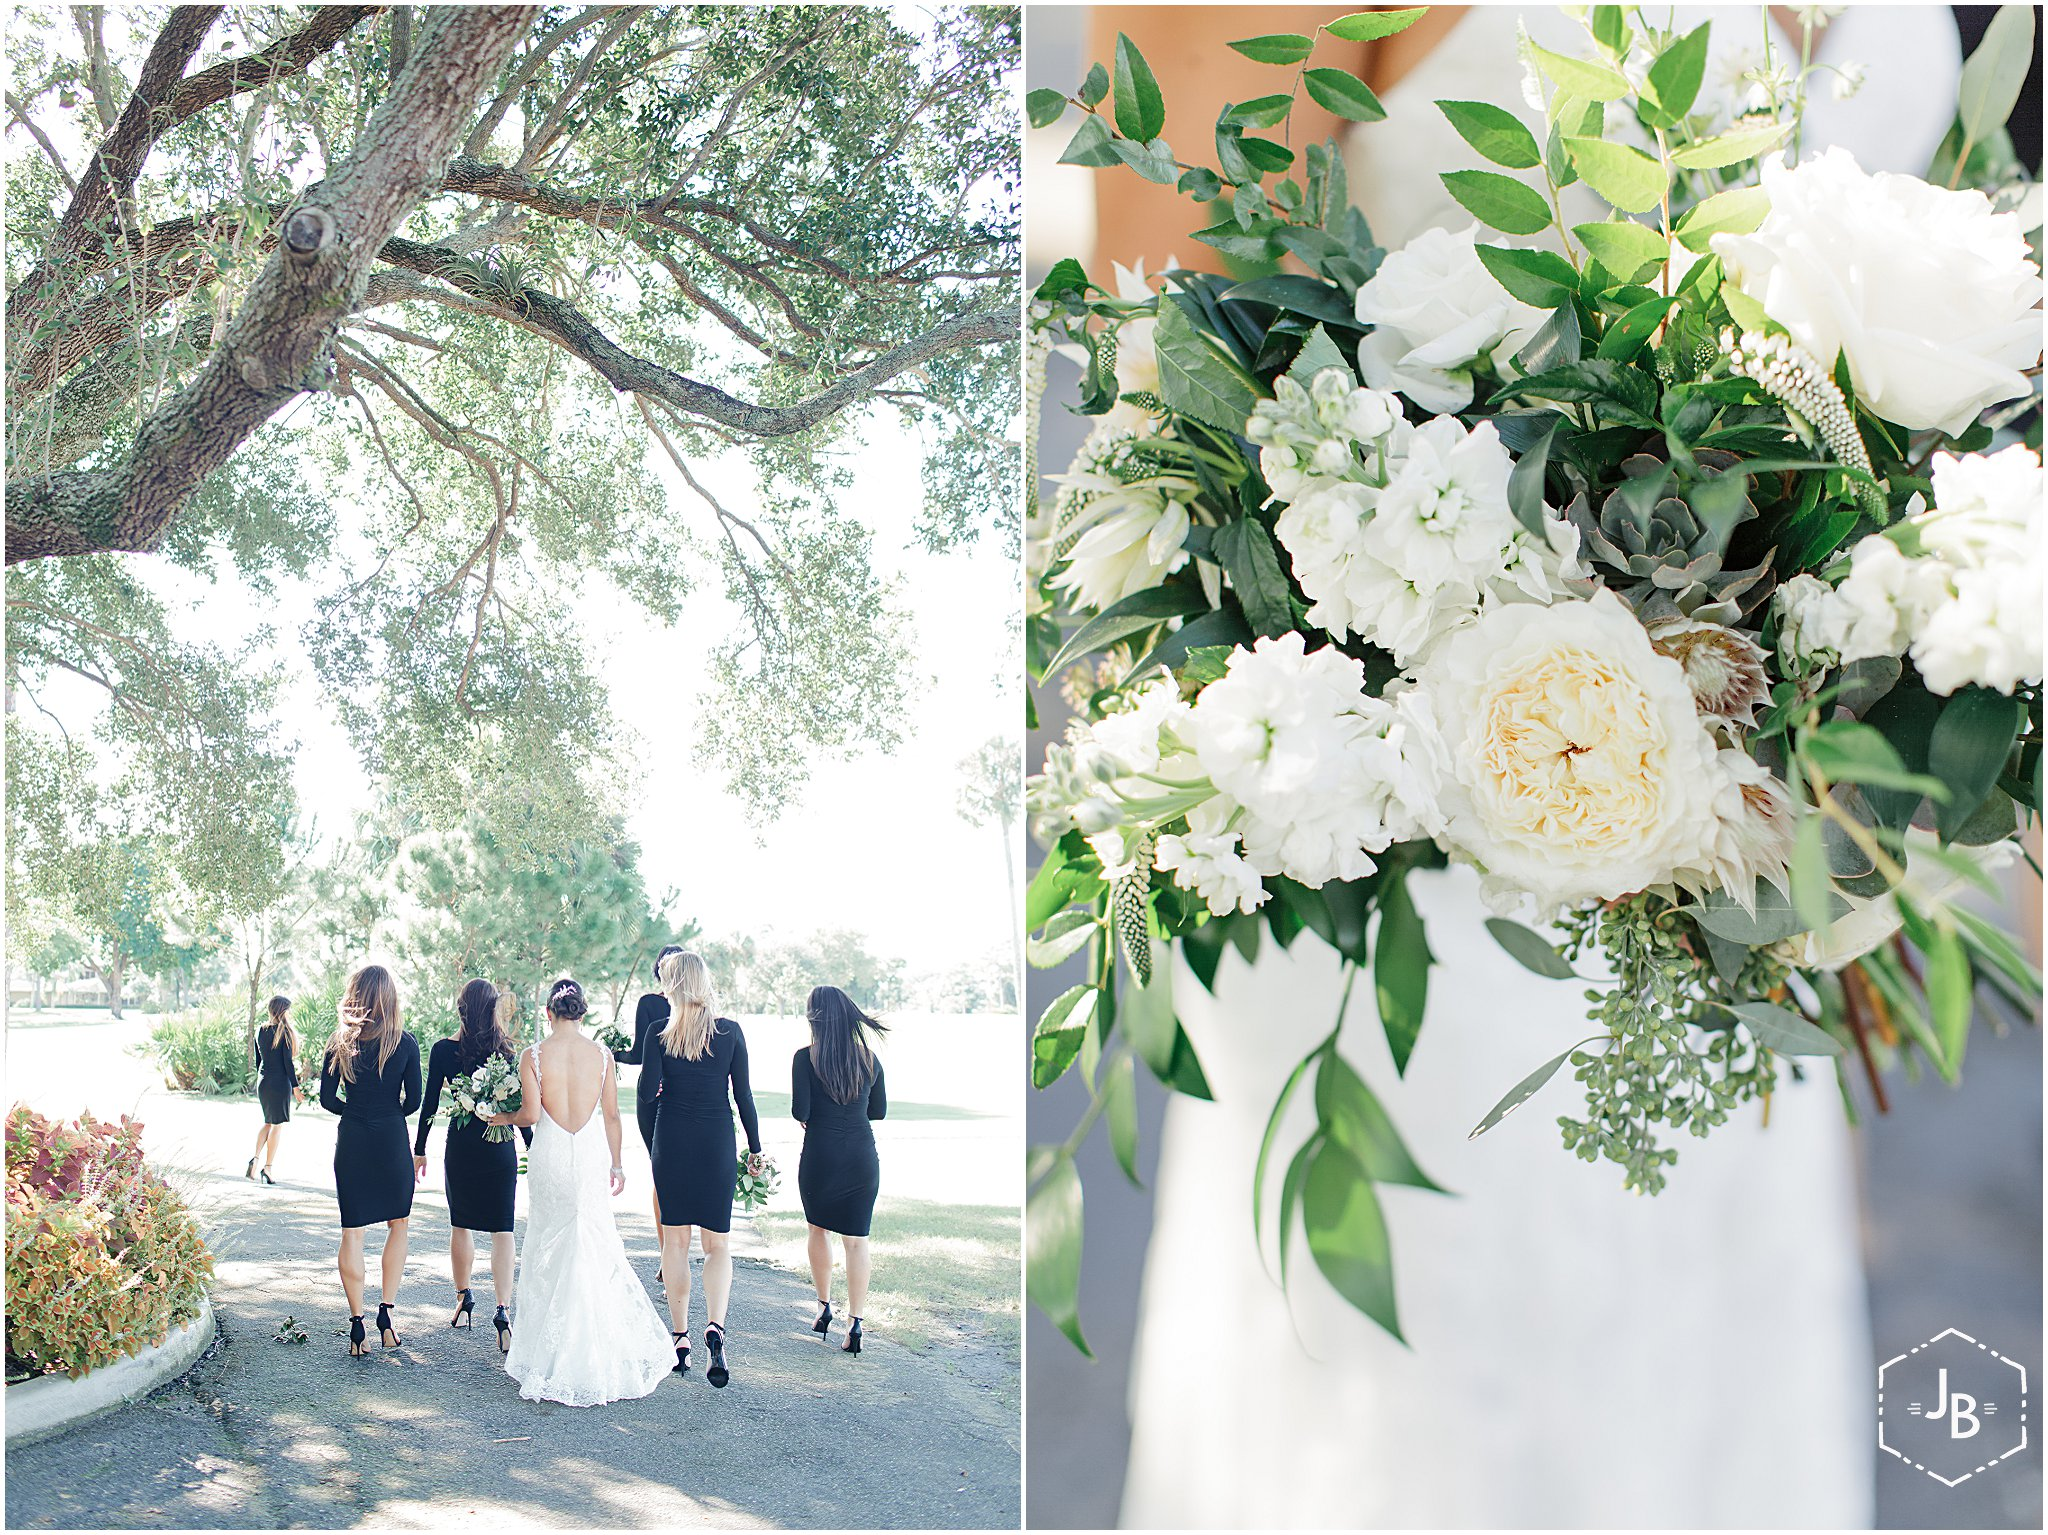 WeddingandEngagementFloridaPhotographer_0238.jpg